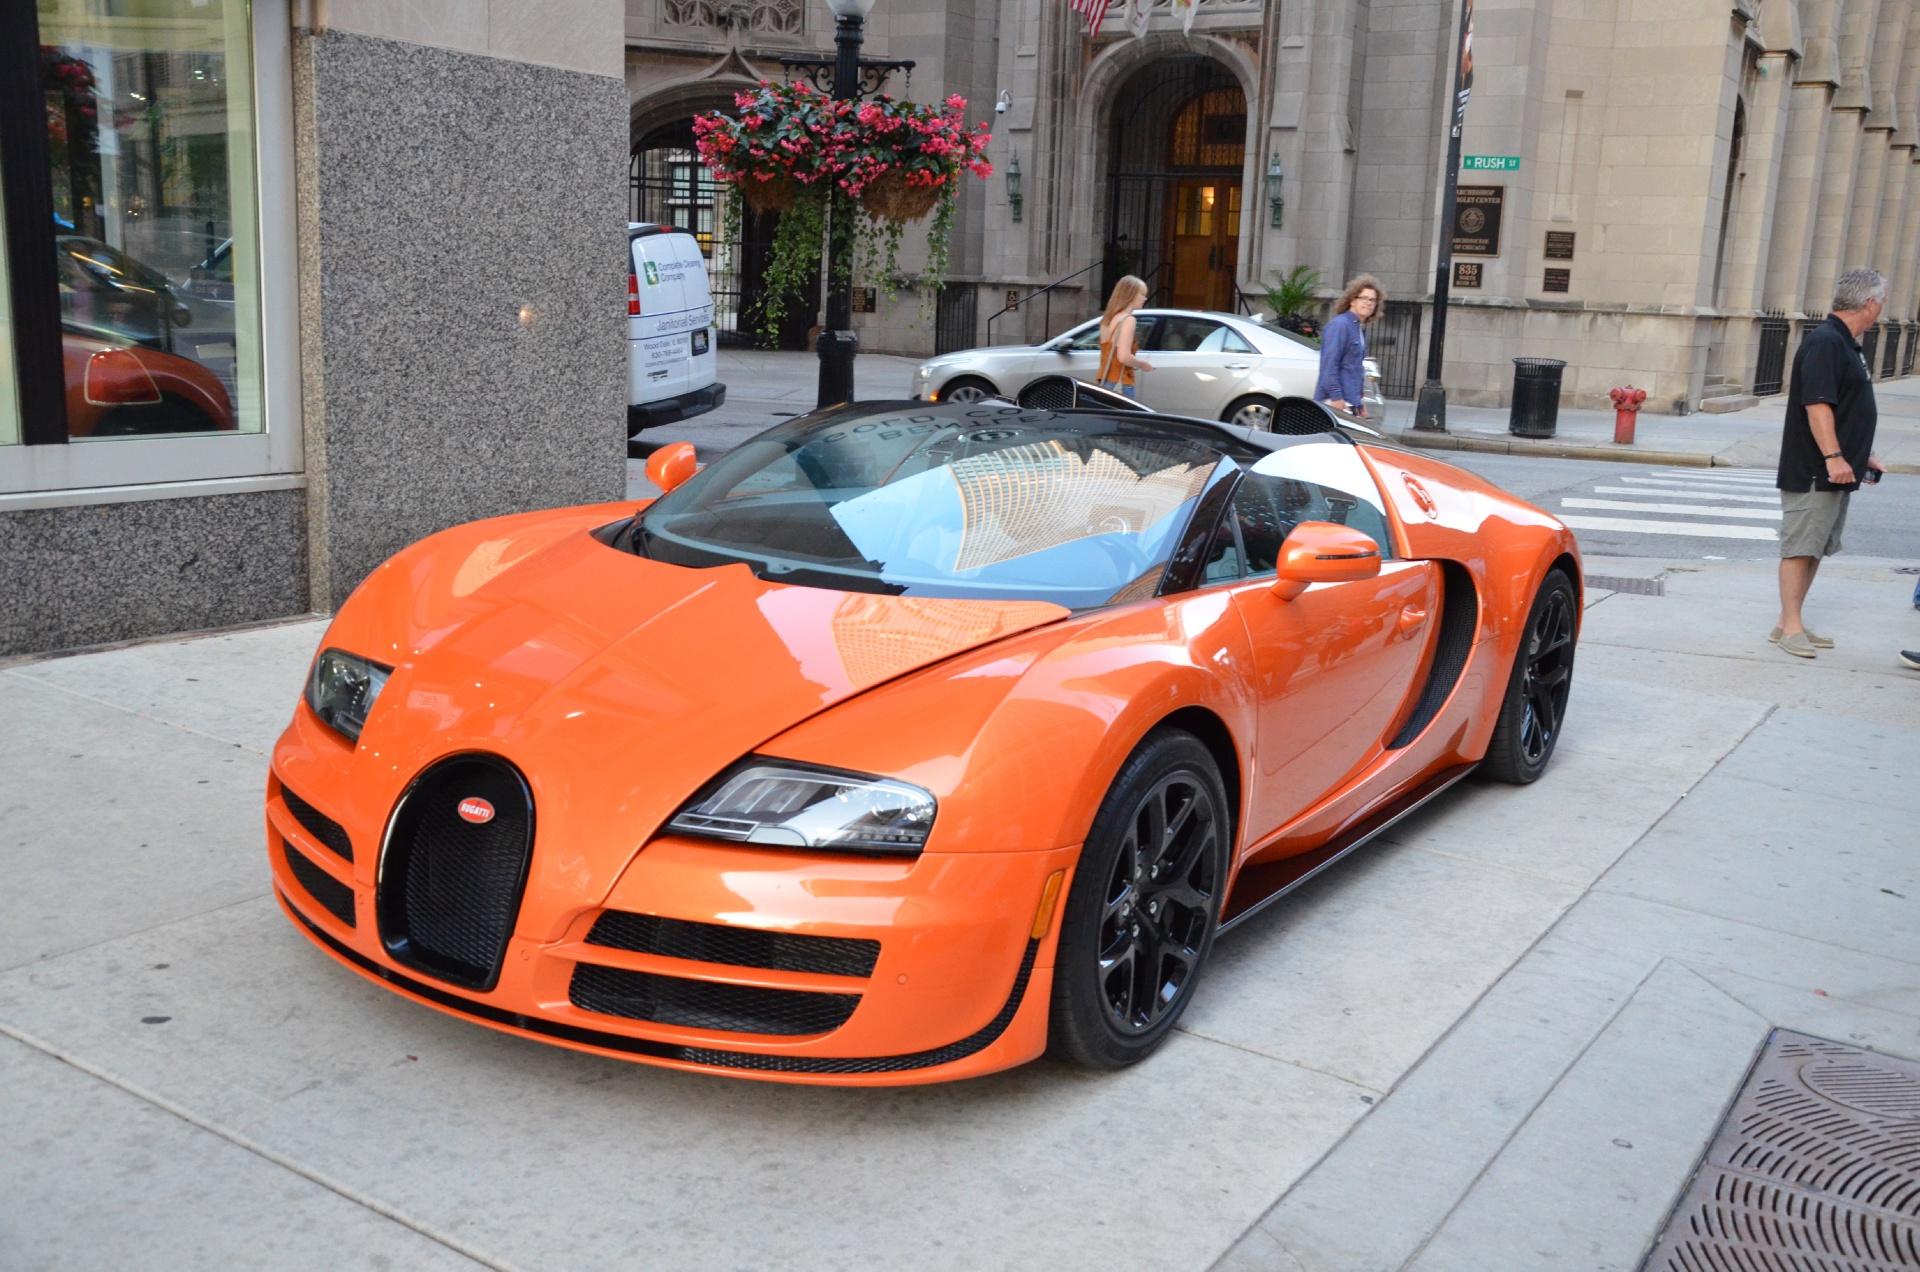 2012 bugatti veyron vitesse stock 95013 for sale near. Black Bedroom Furniture Sets. Home Design Ideas